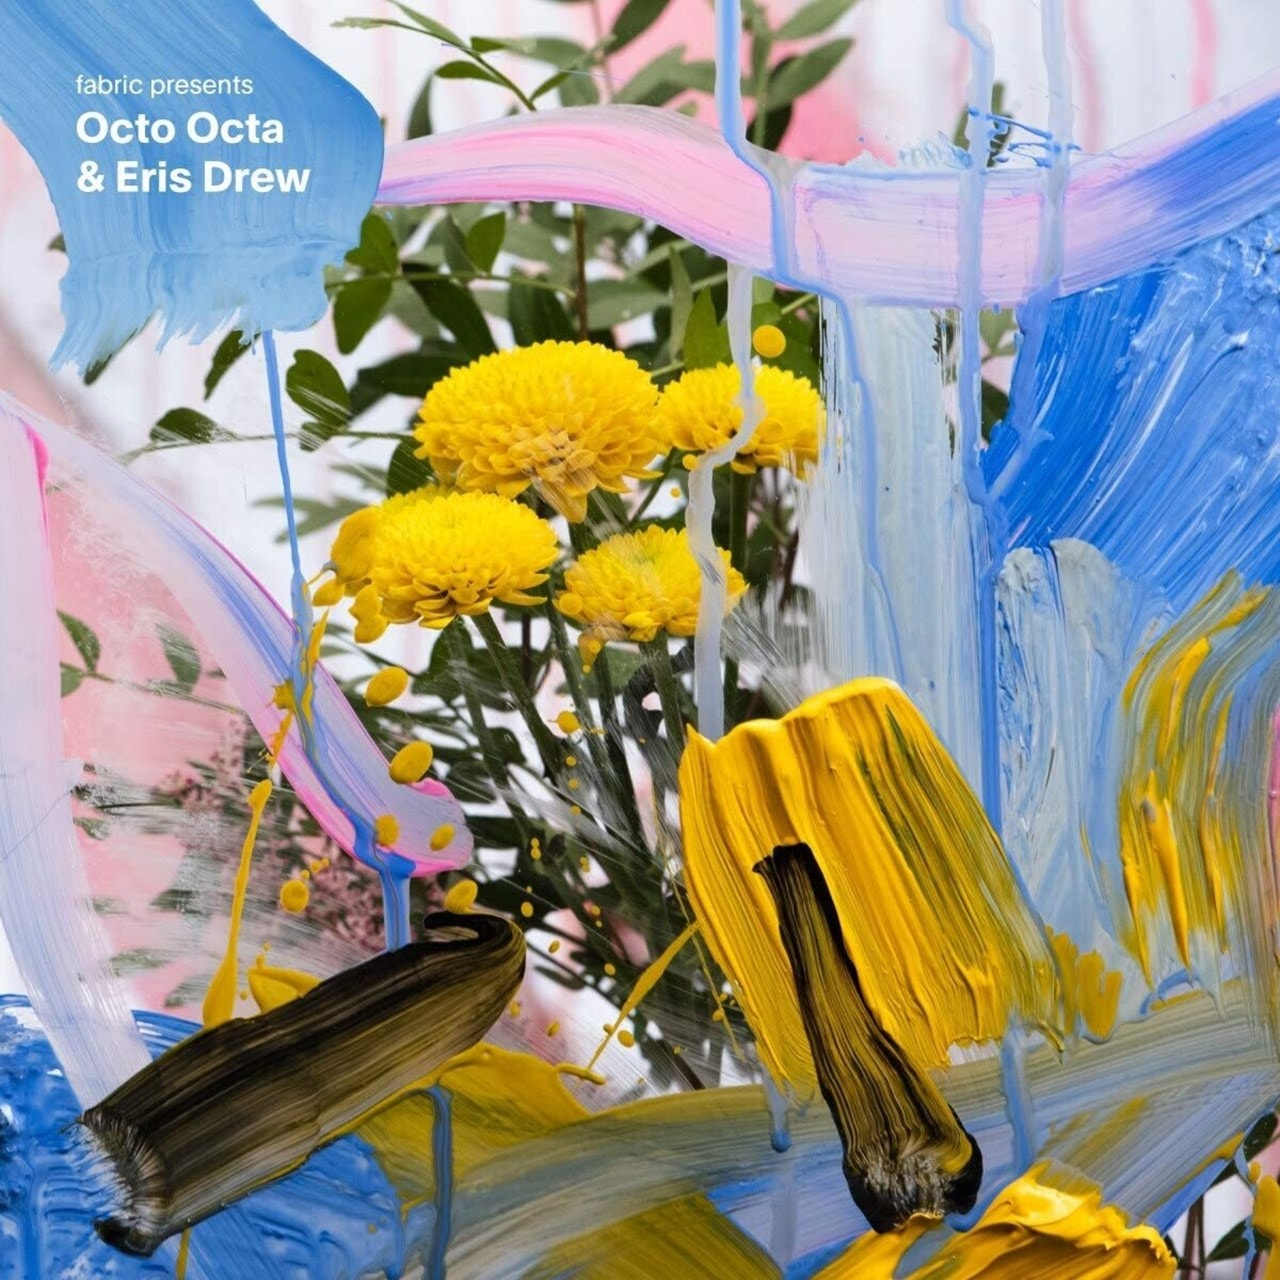 Fabric Presents Octo Octa & Eris Drew - 1